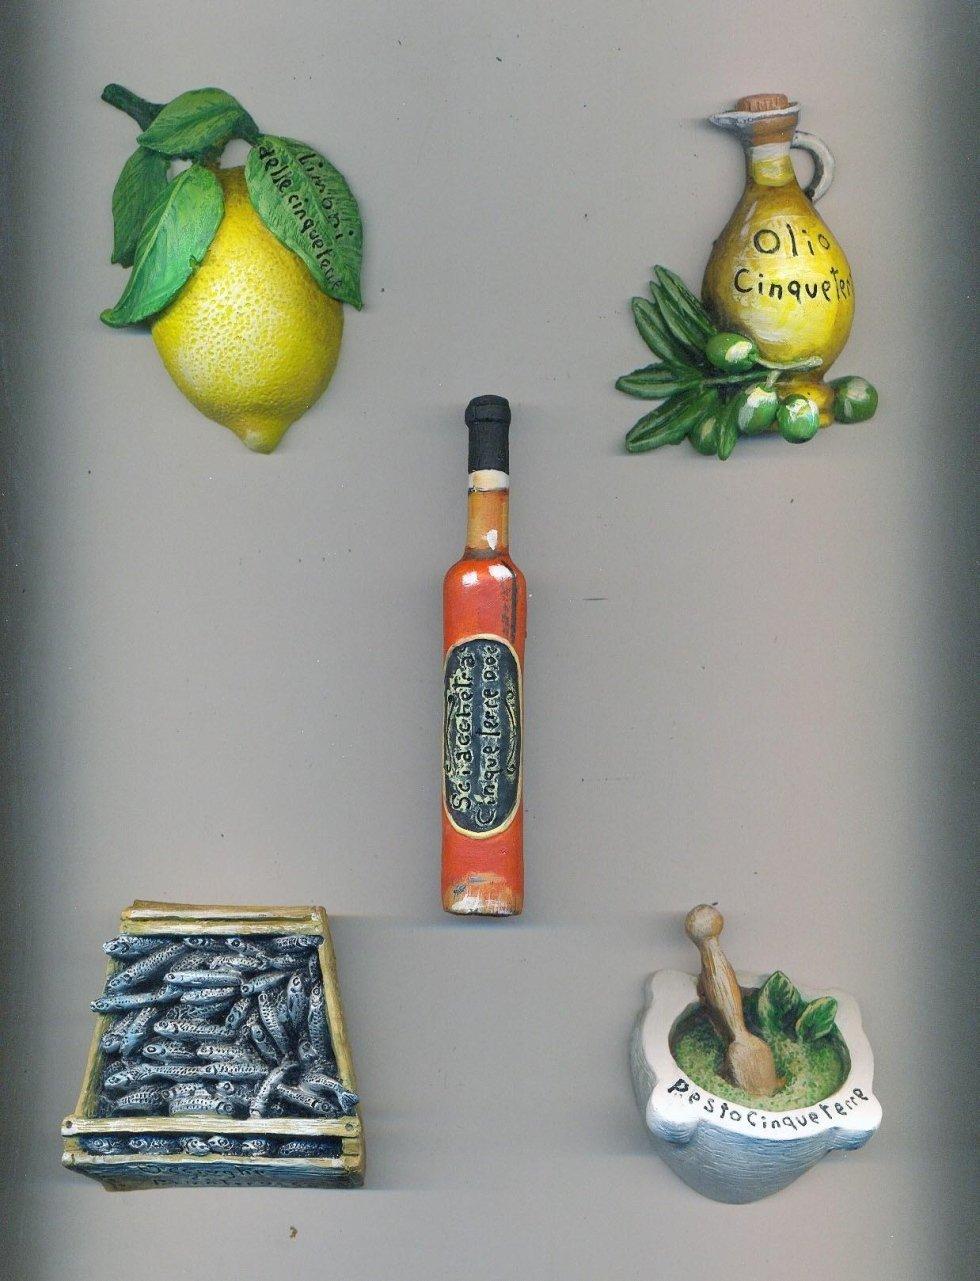 Magneti food milano istituto grafico italiano for Istituto grafico pubblicitario milano